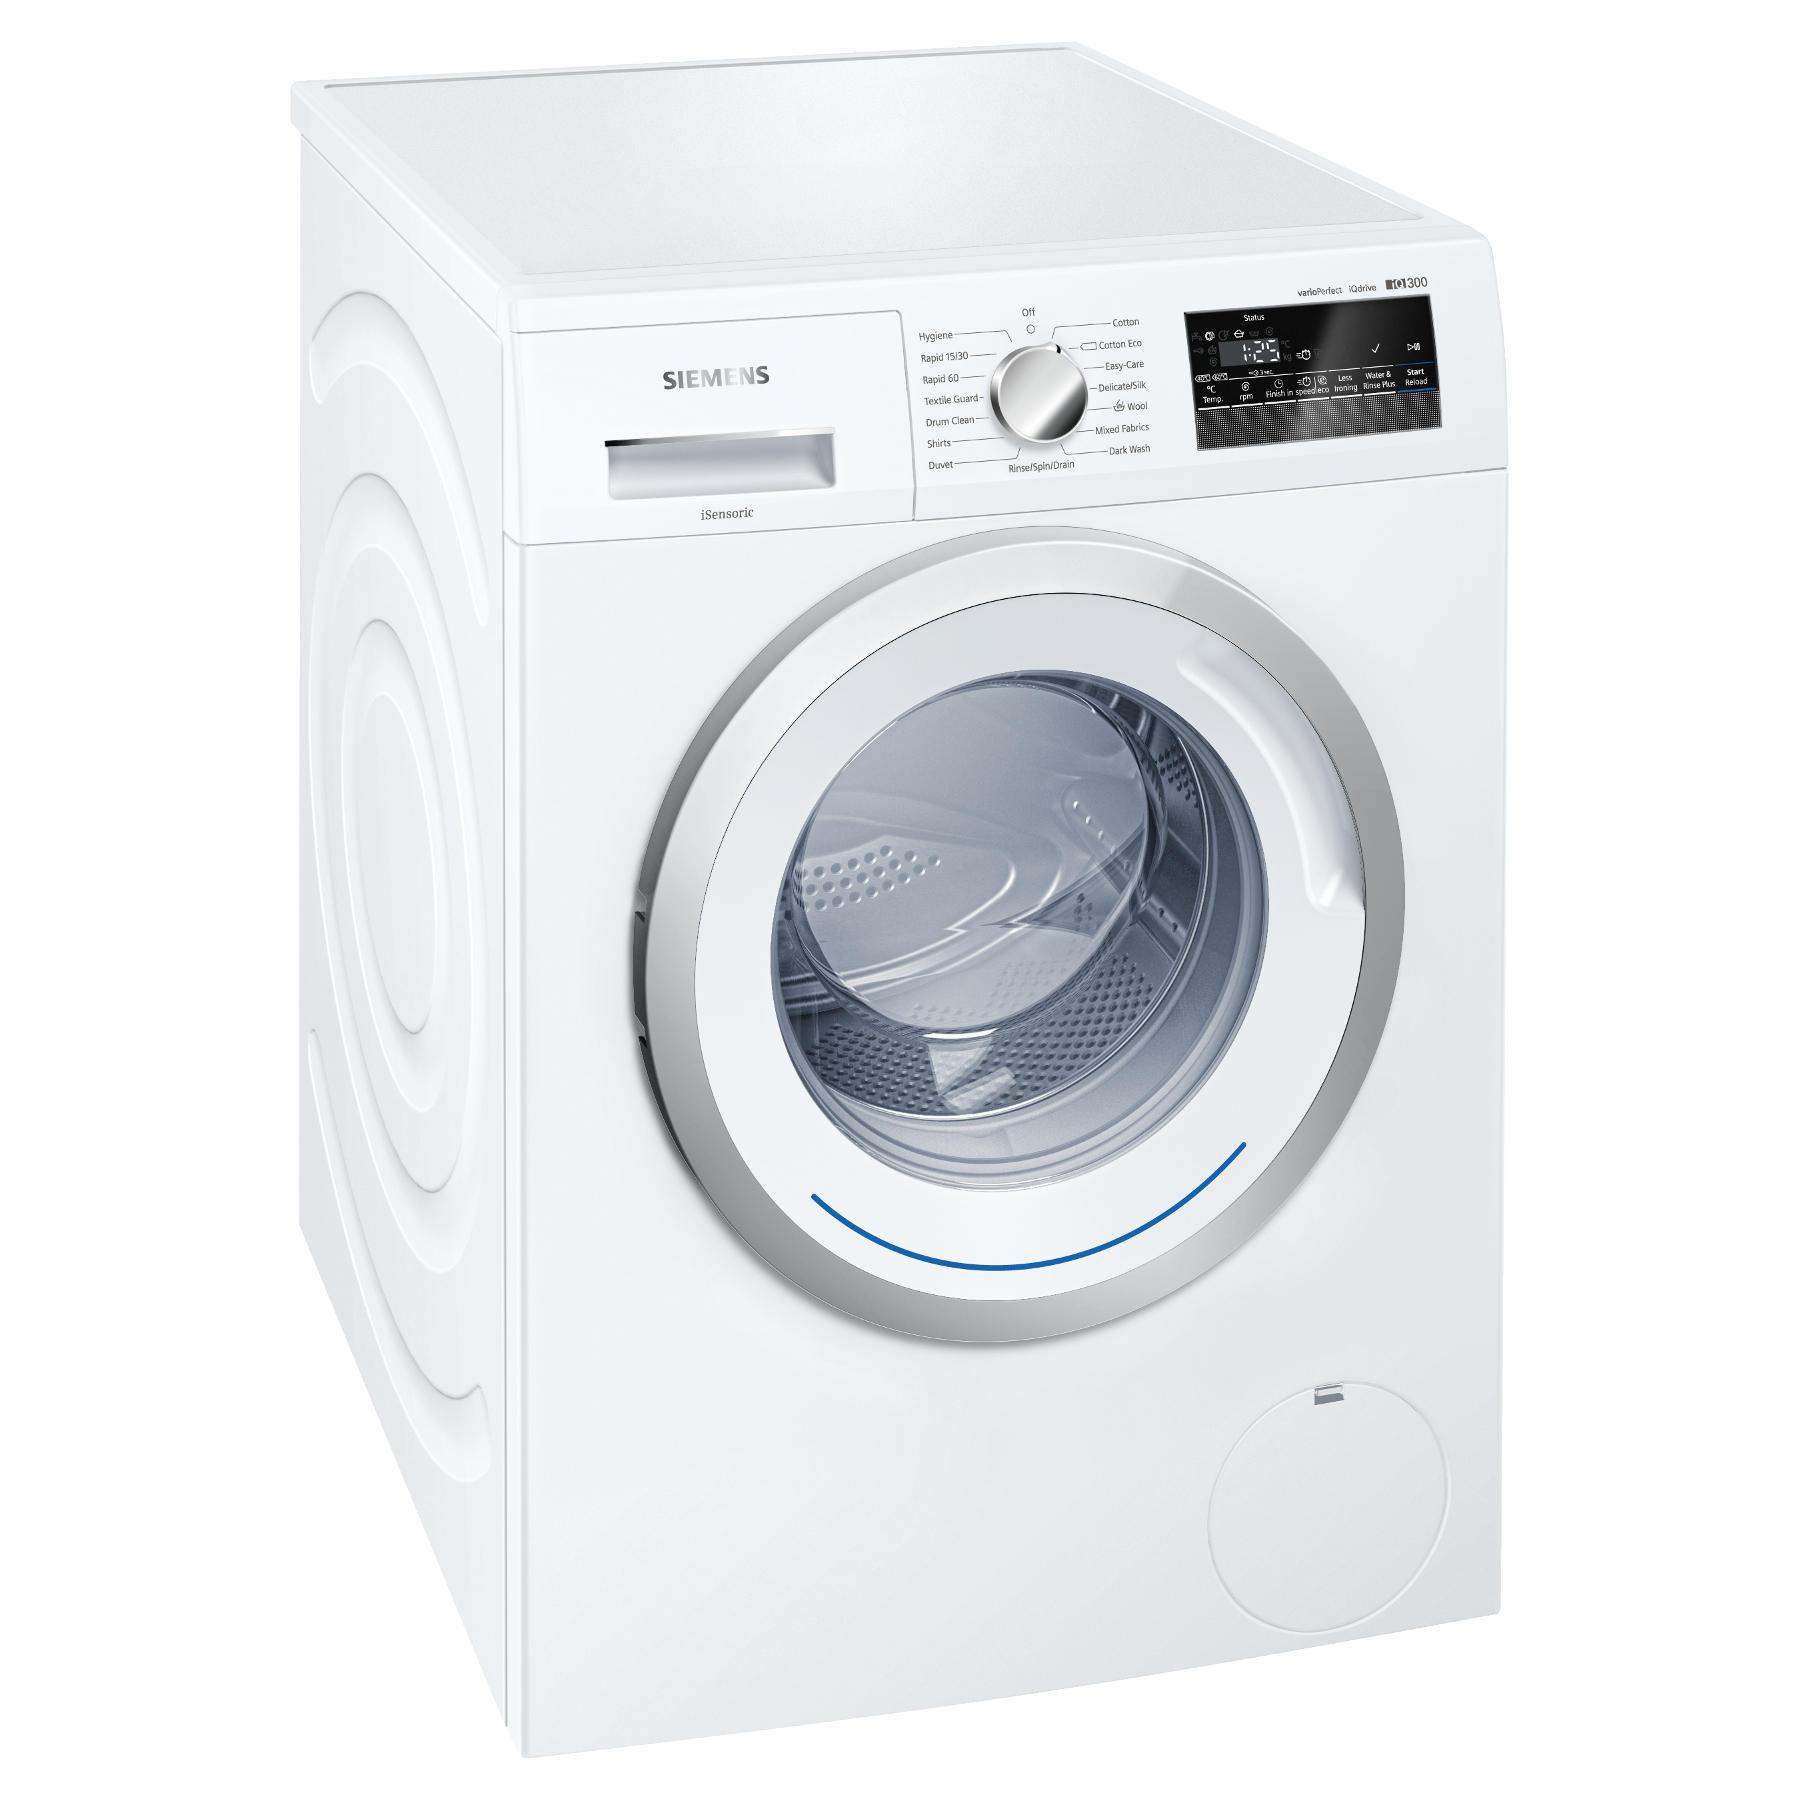 Siemens WM14N200GB iQ300 Front loading automatic washing machine